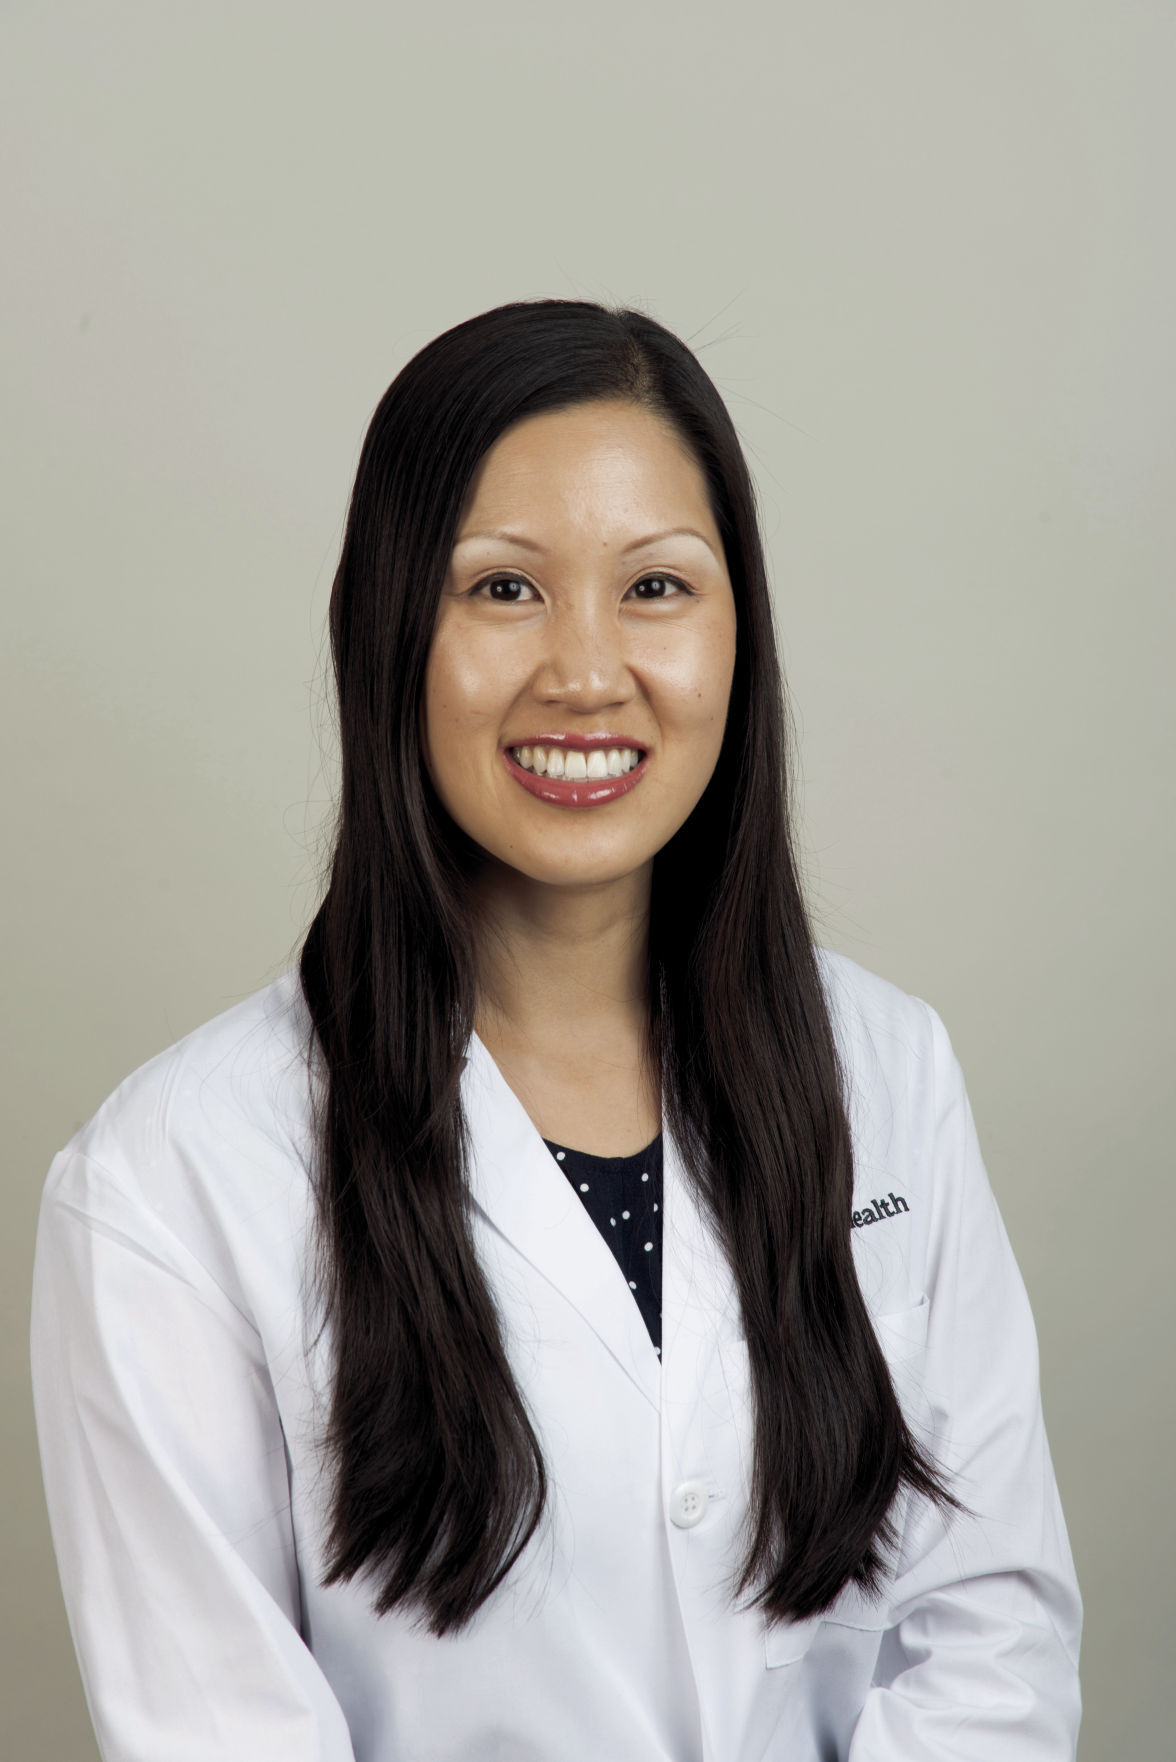 Dr. Elizabeth Ko